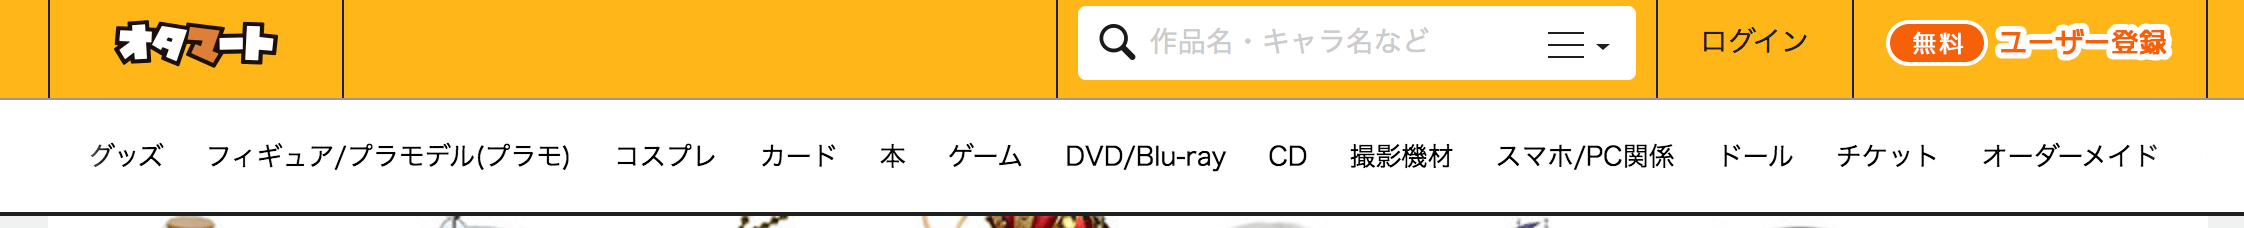 Otamart search bar